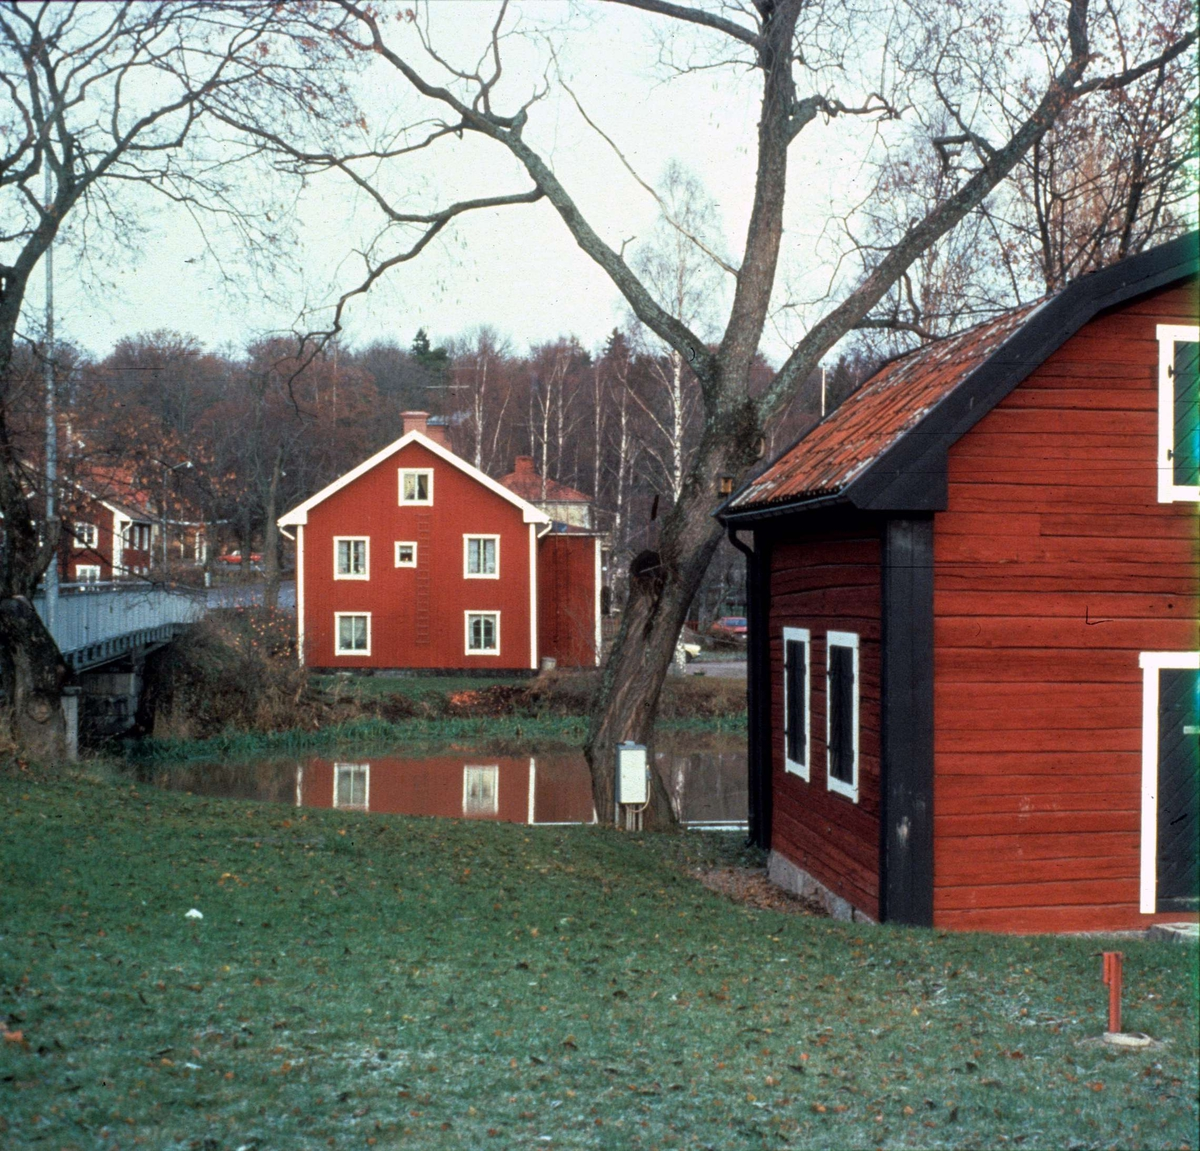 (Sweden) AB - FretagsFakta - Sk efter fretag i hela Sverige